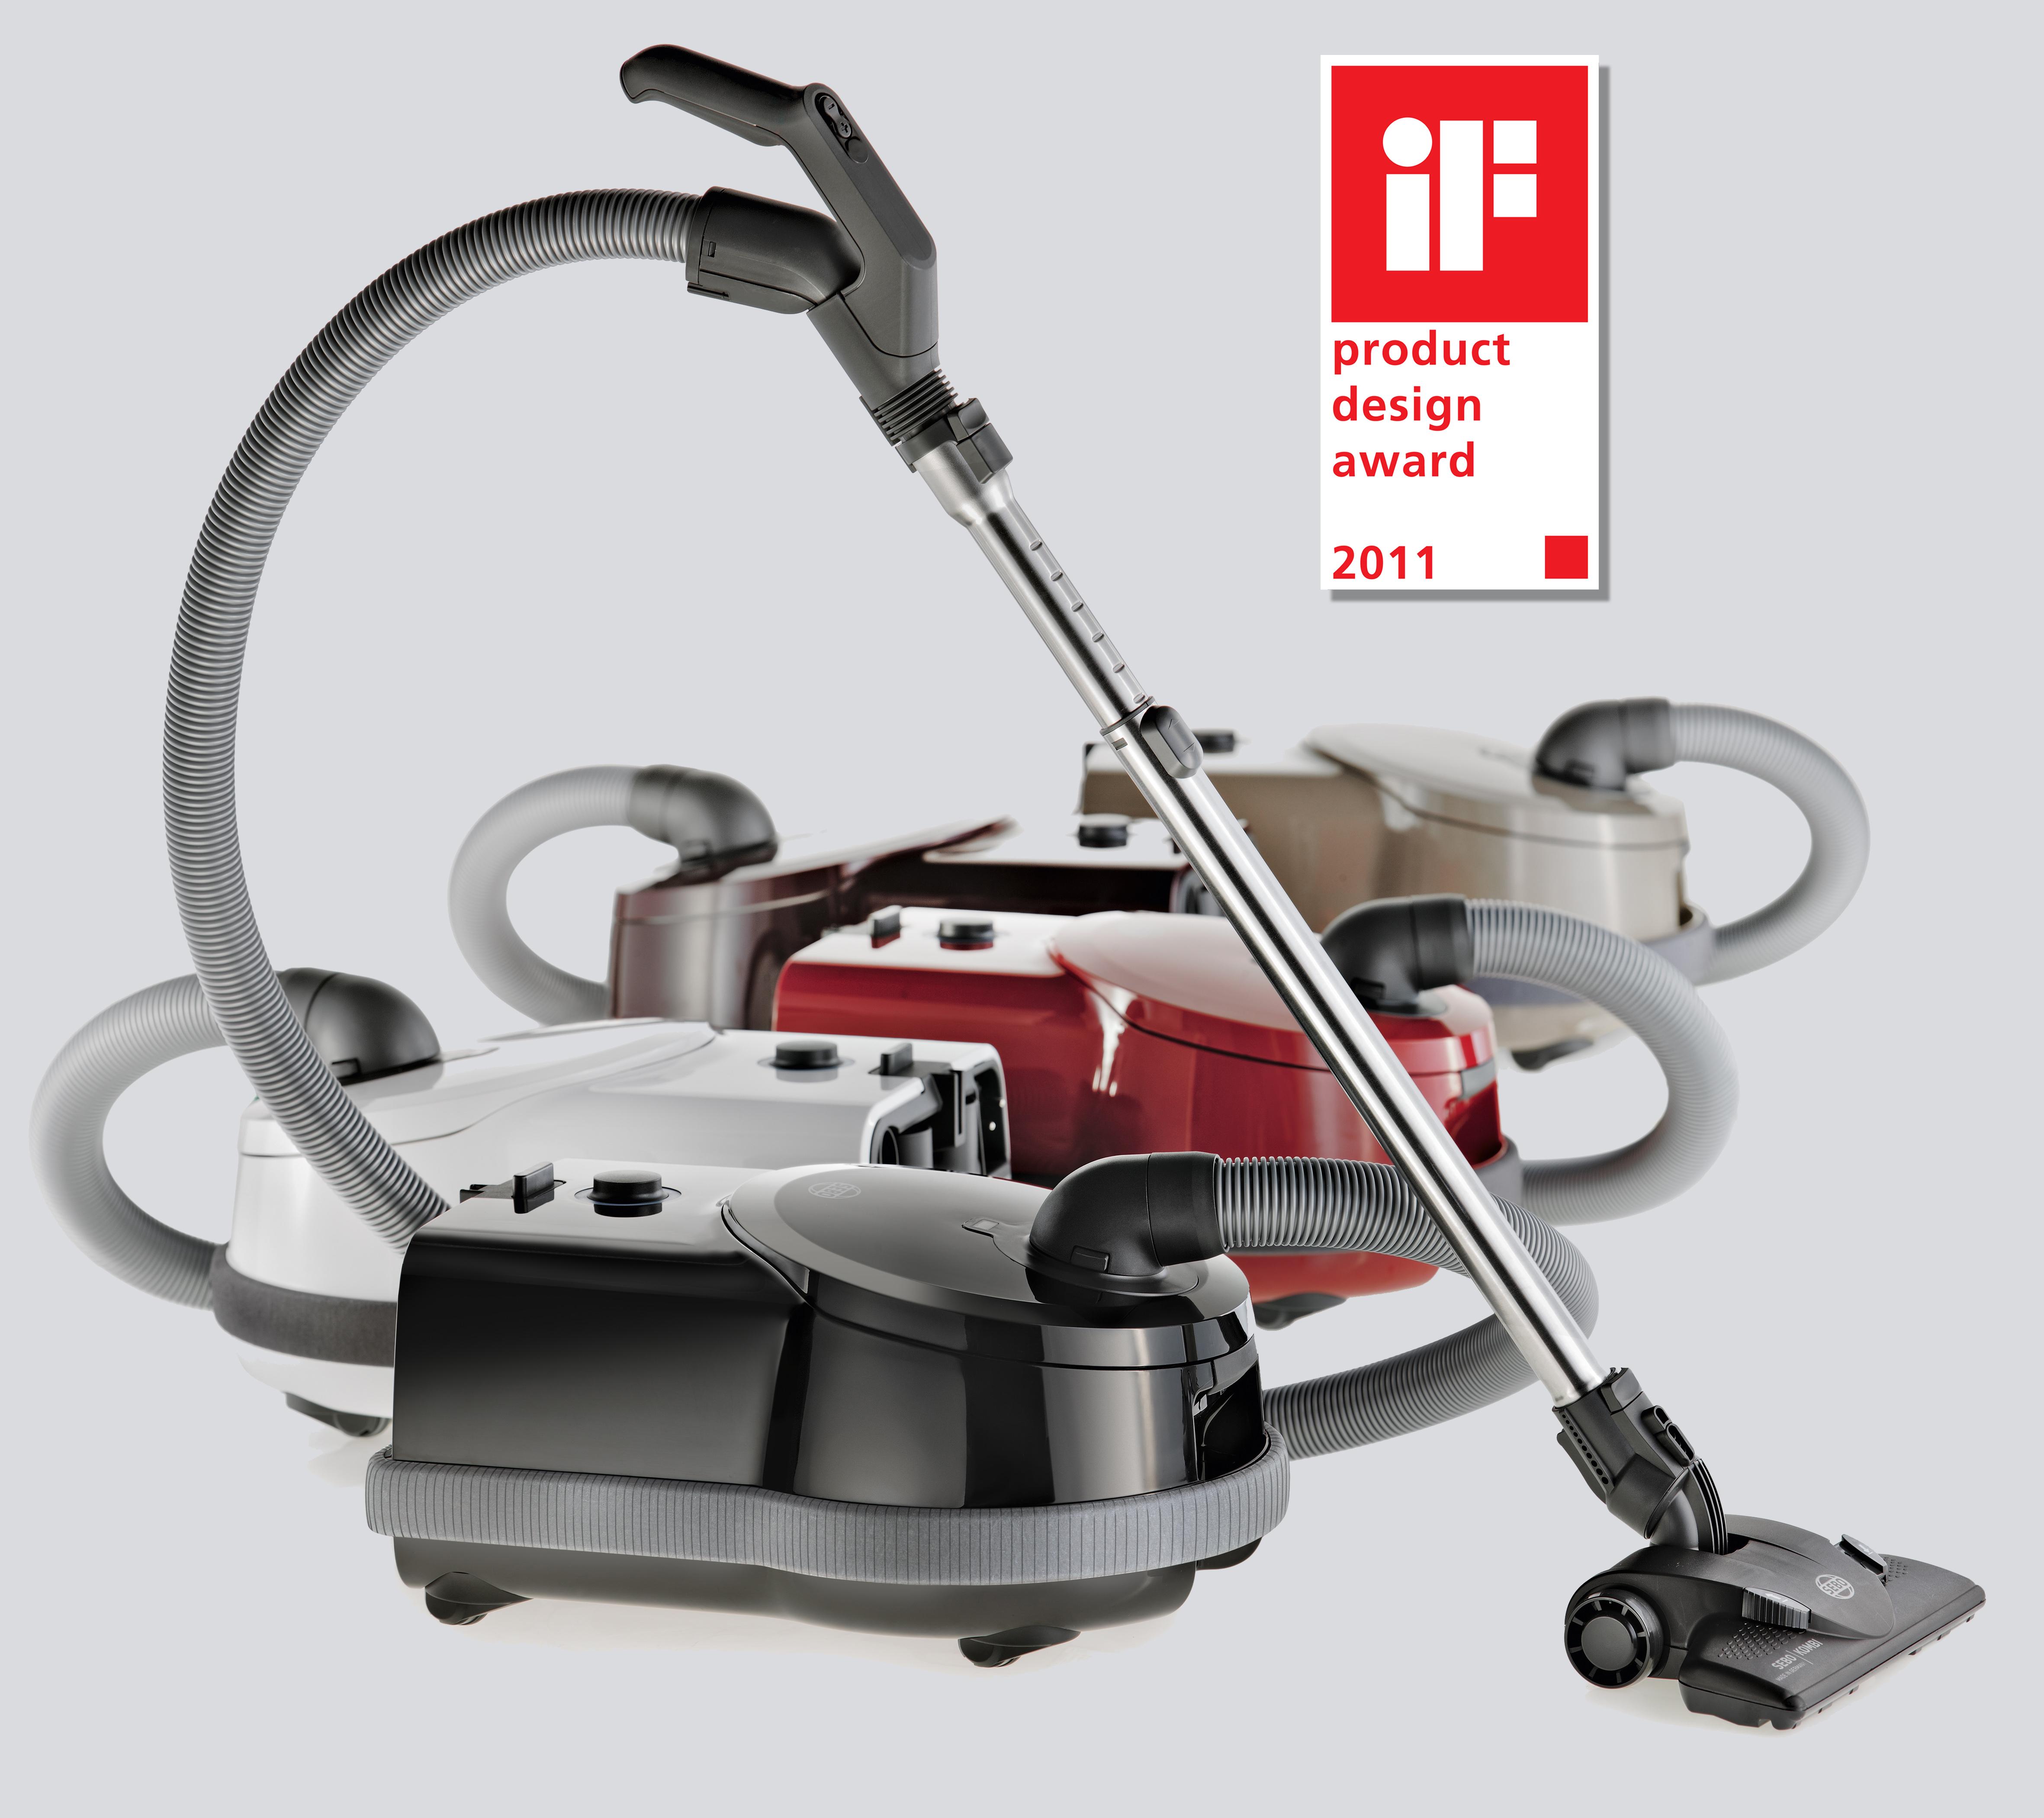 sebo airbelt d staubsauger sebo airbelt d staubsauger mit if product design award 2011. Black Bedroom Furniture Sets. Home Design Ideas